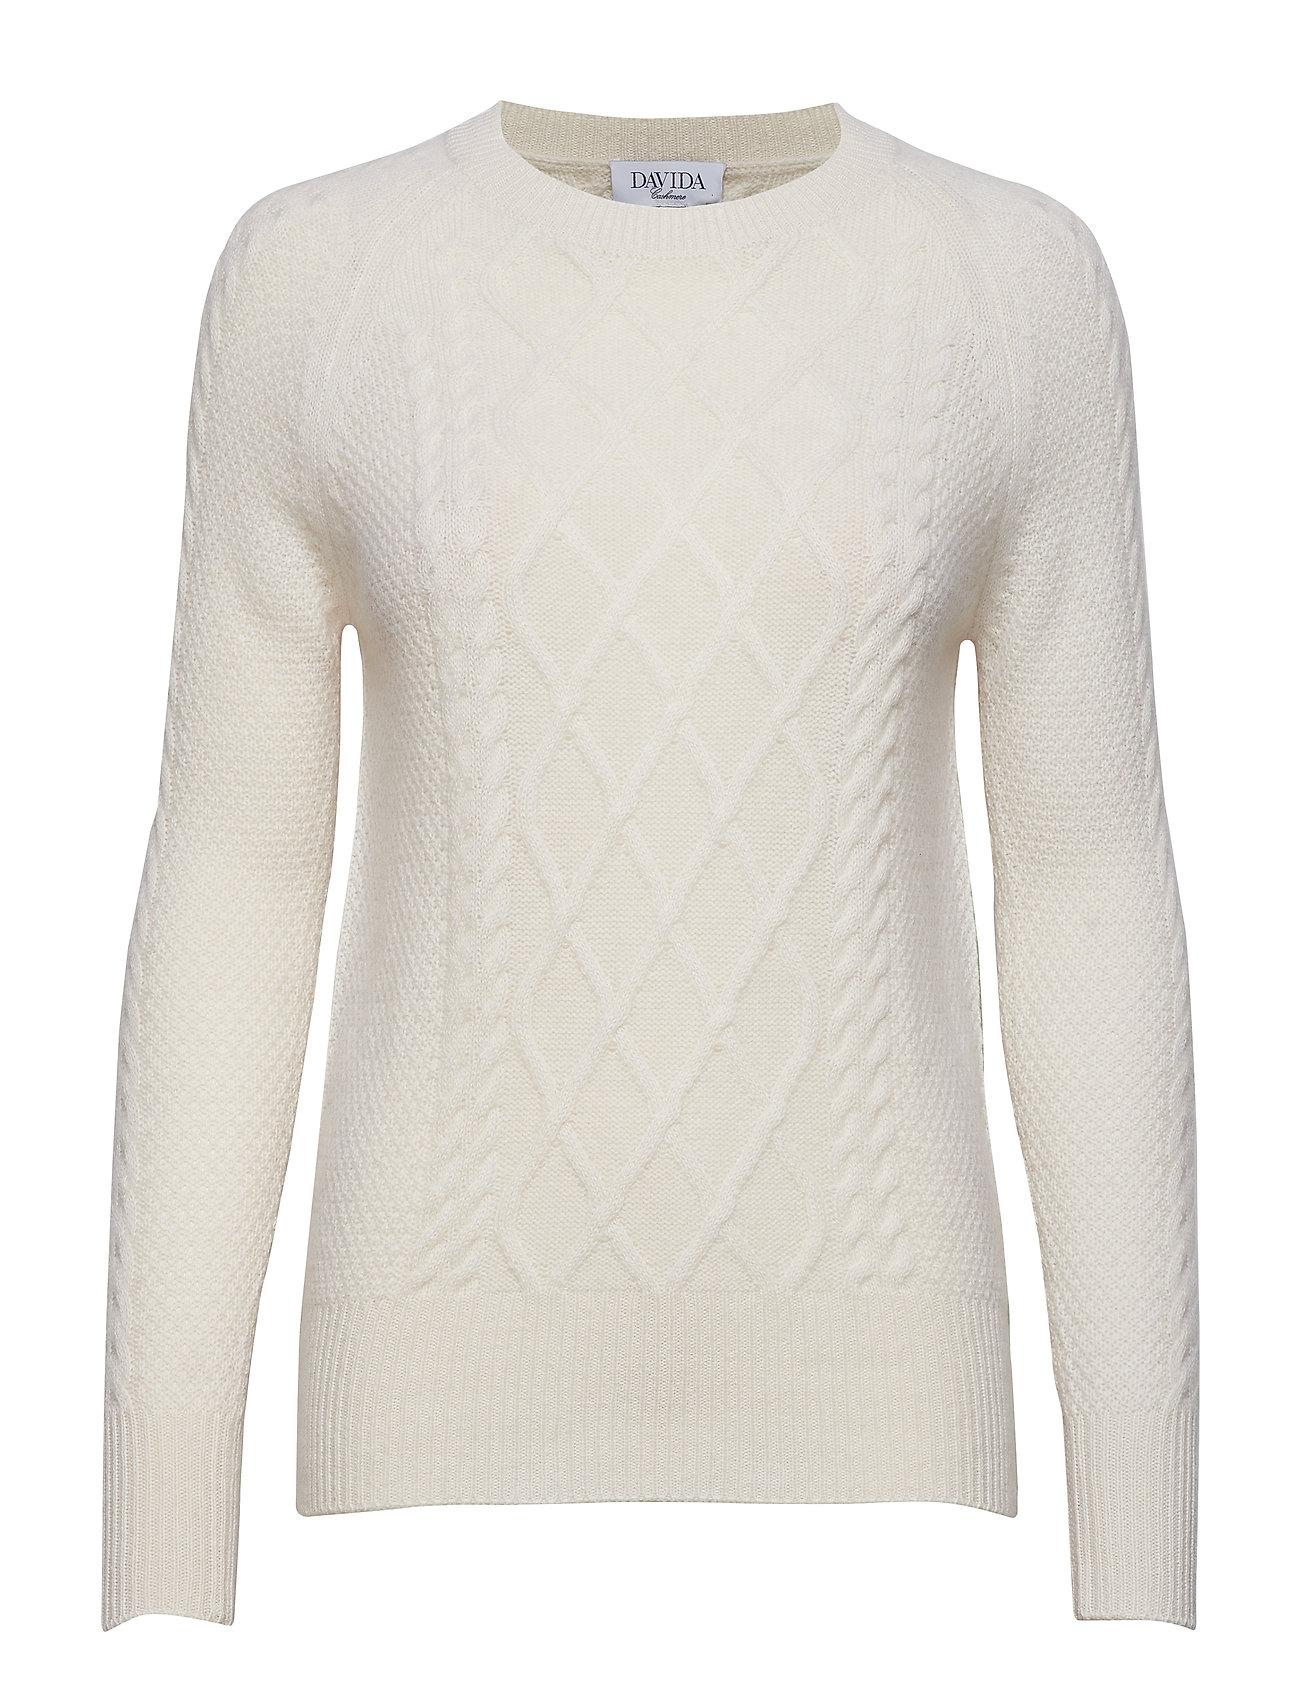 Davida Cashmere Cable Detail Sweater - WHITE